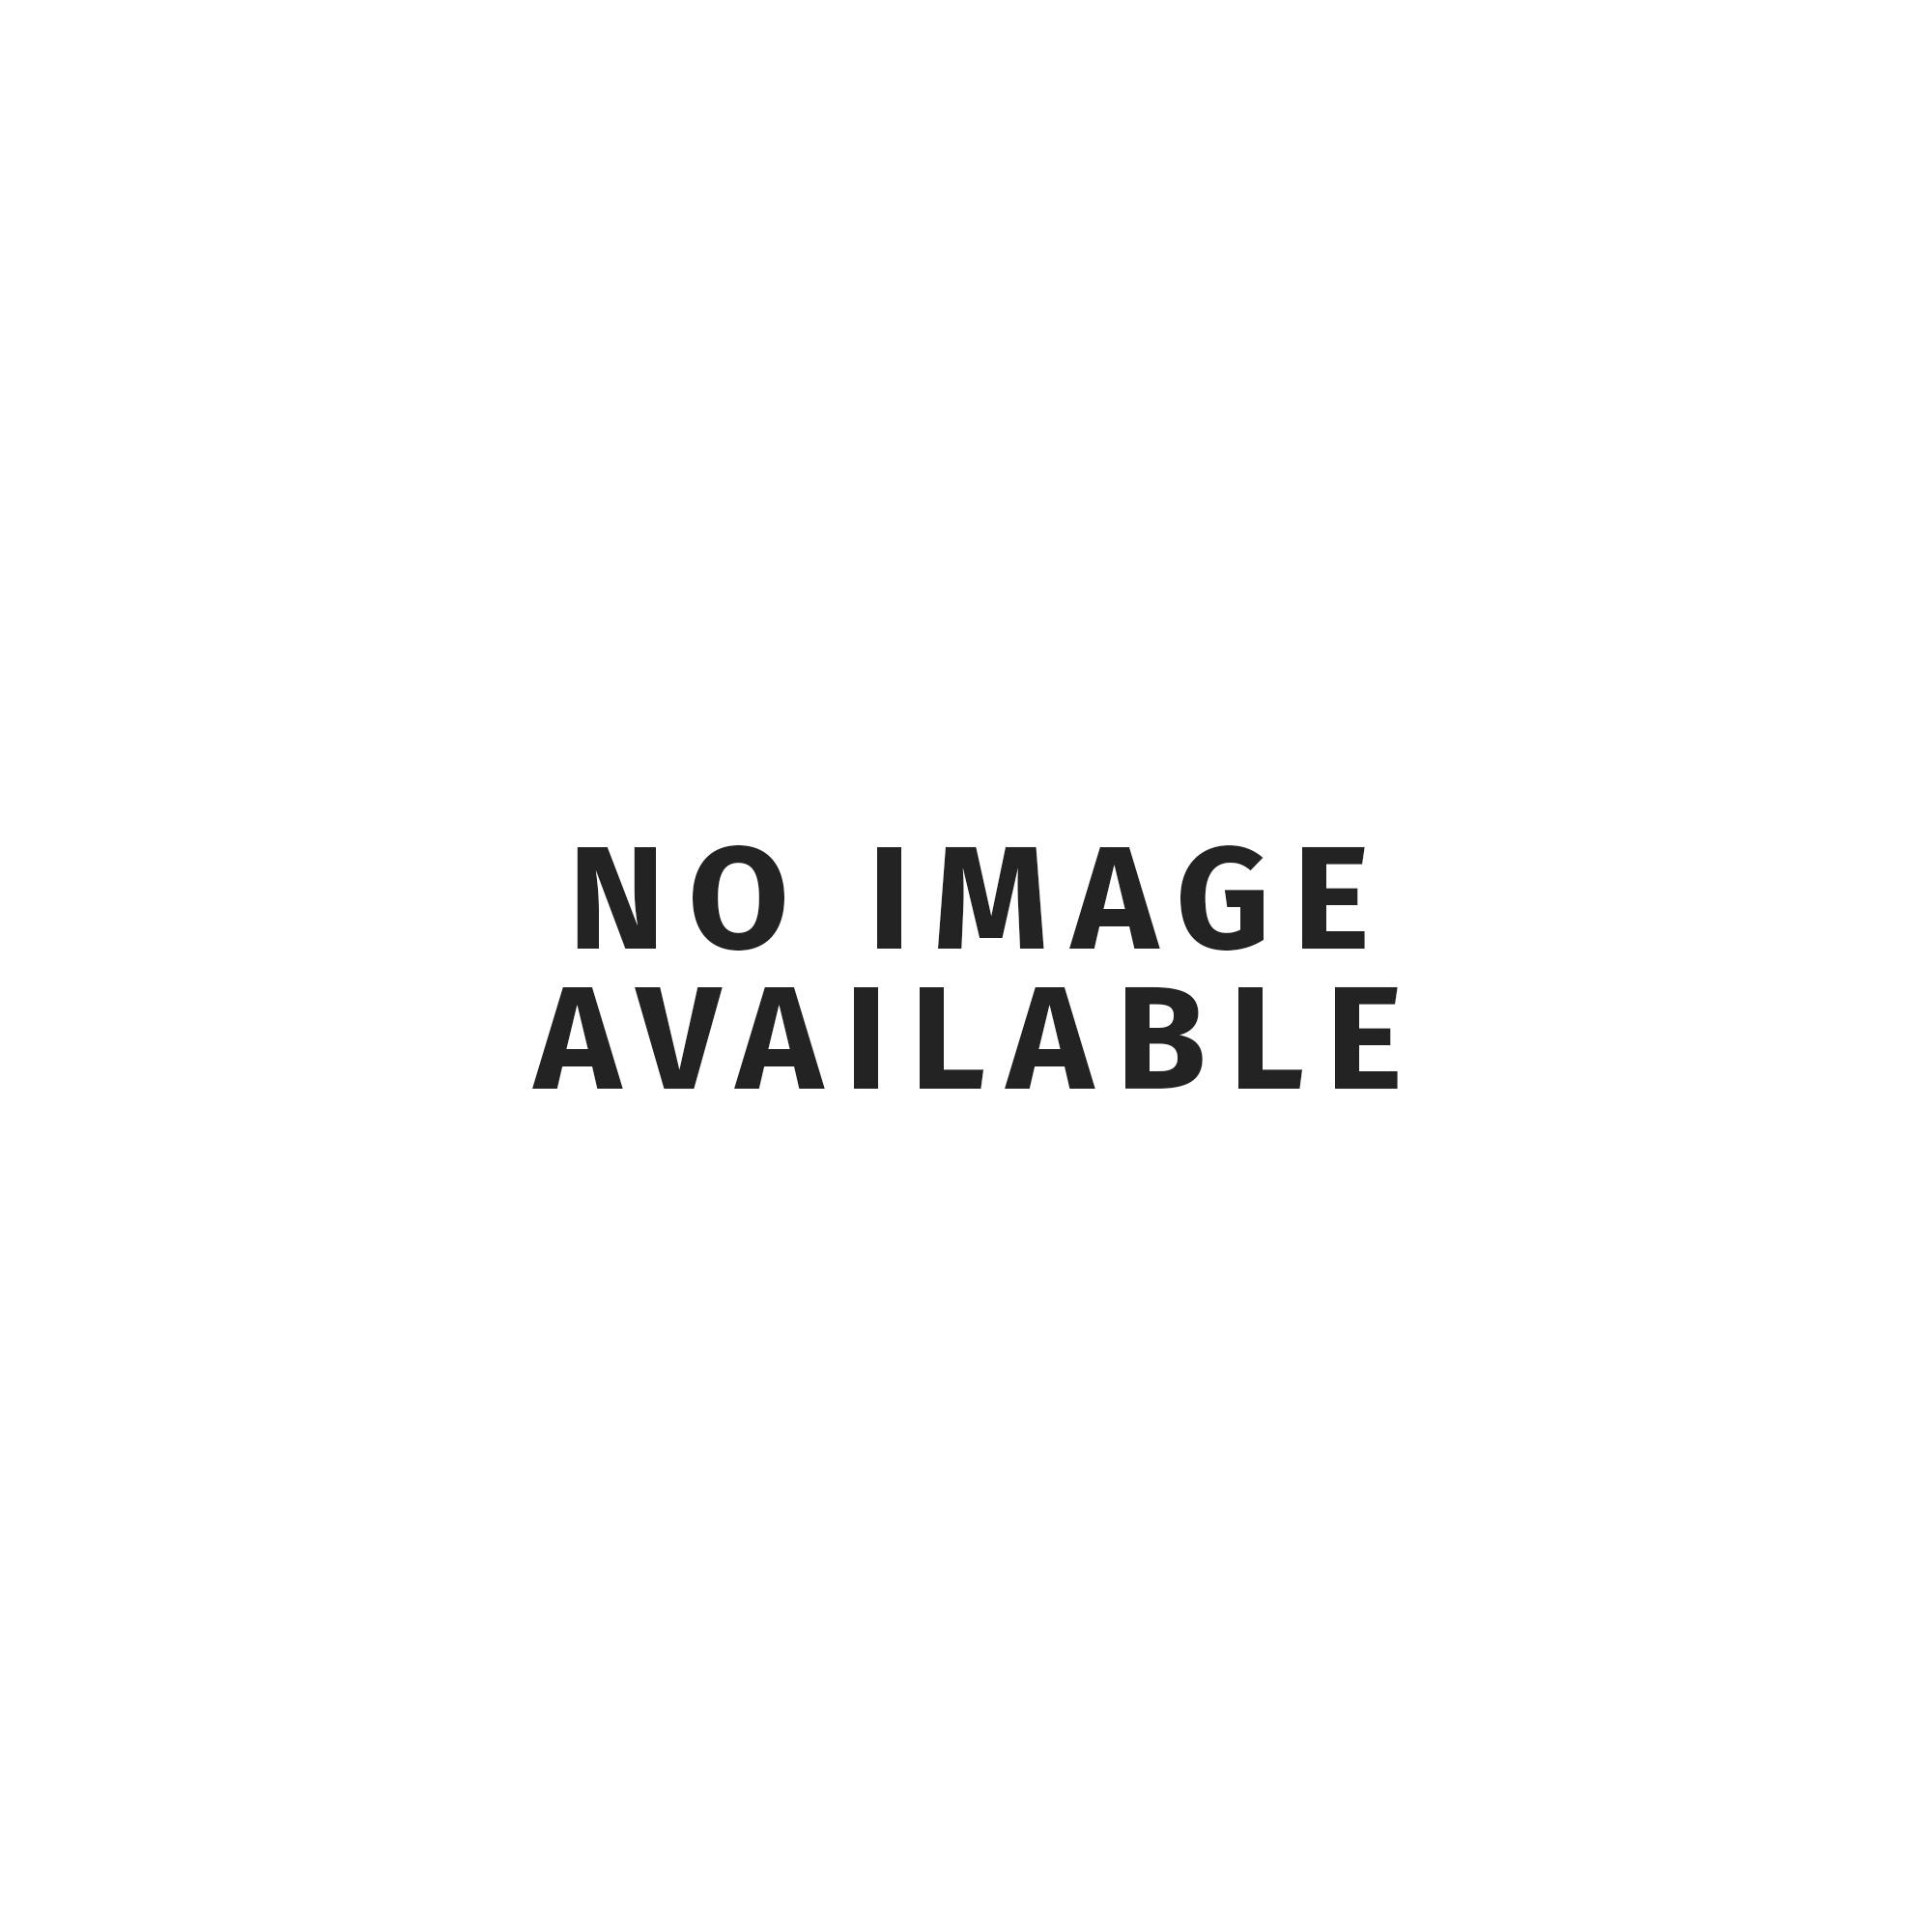 Gt Zaskar Elite 650b XC Mountain Bike 2015